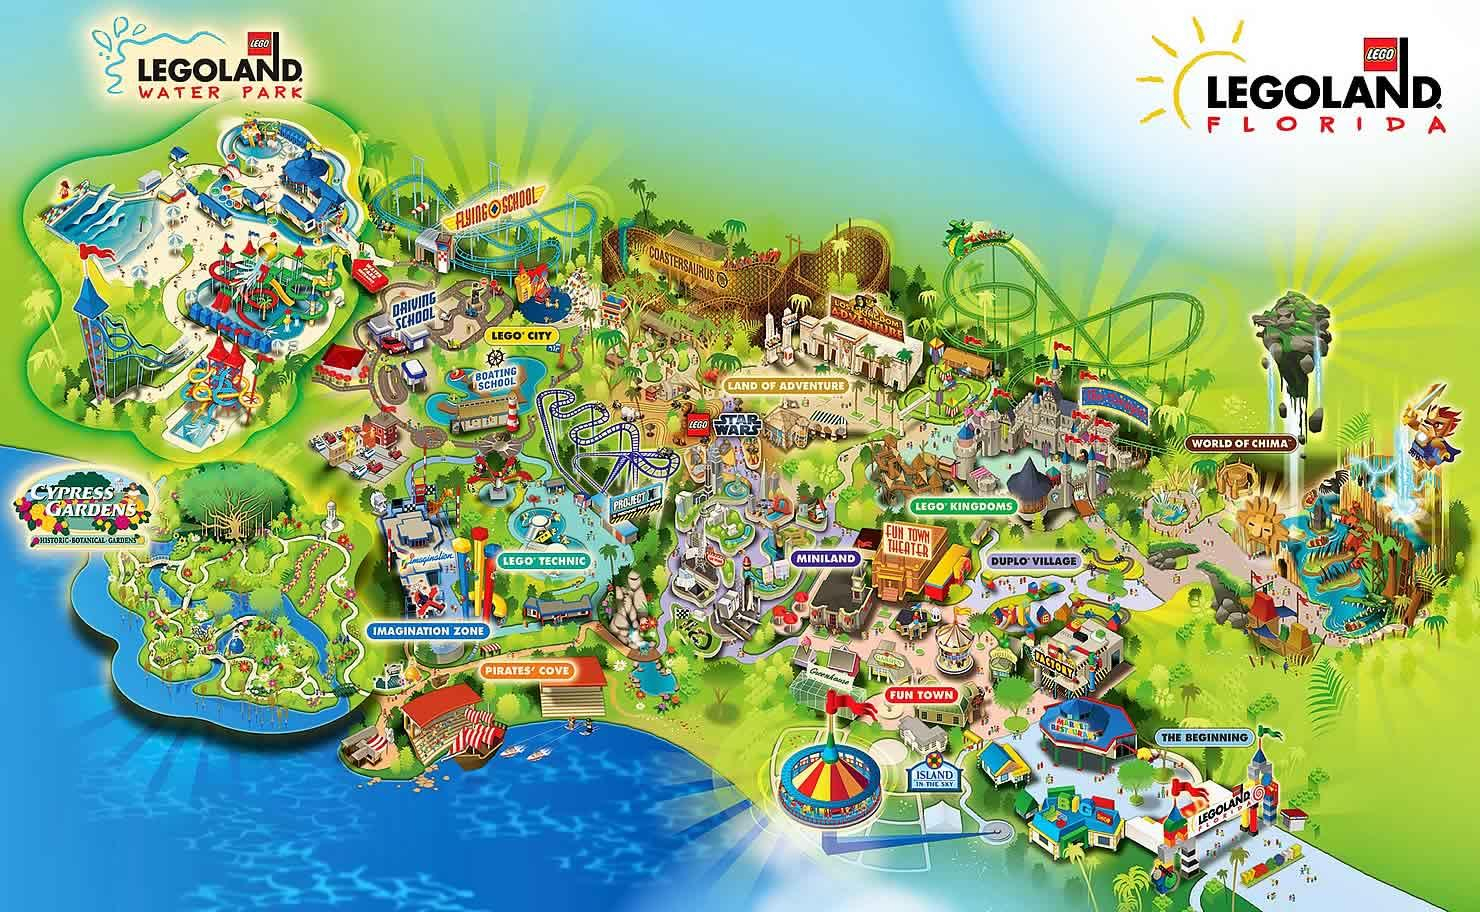 Legoland Usa Florida - Xdata.fr - Orlando Florida Theme Parks Map